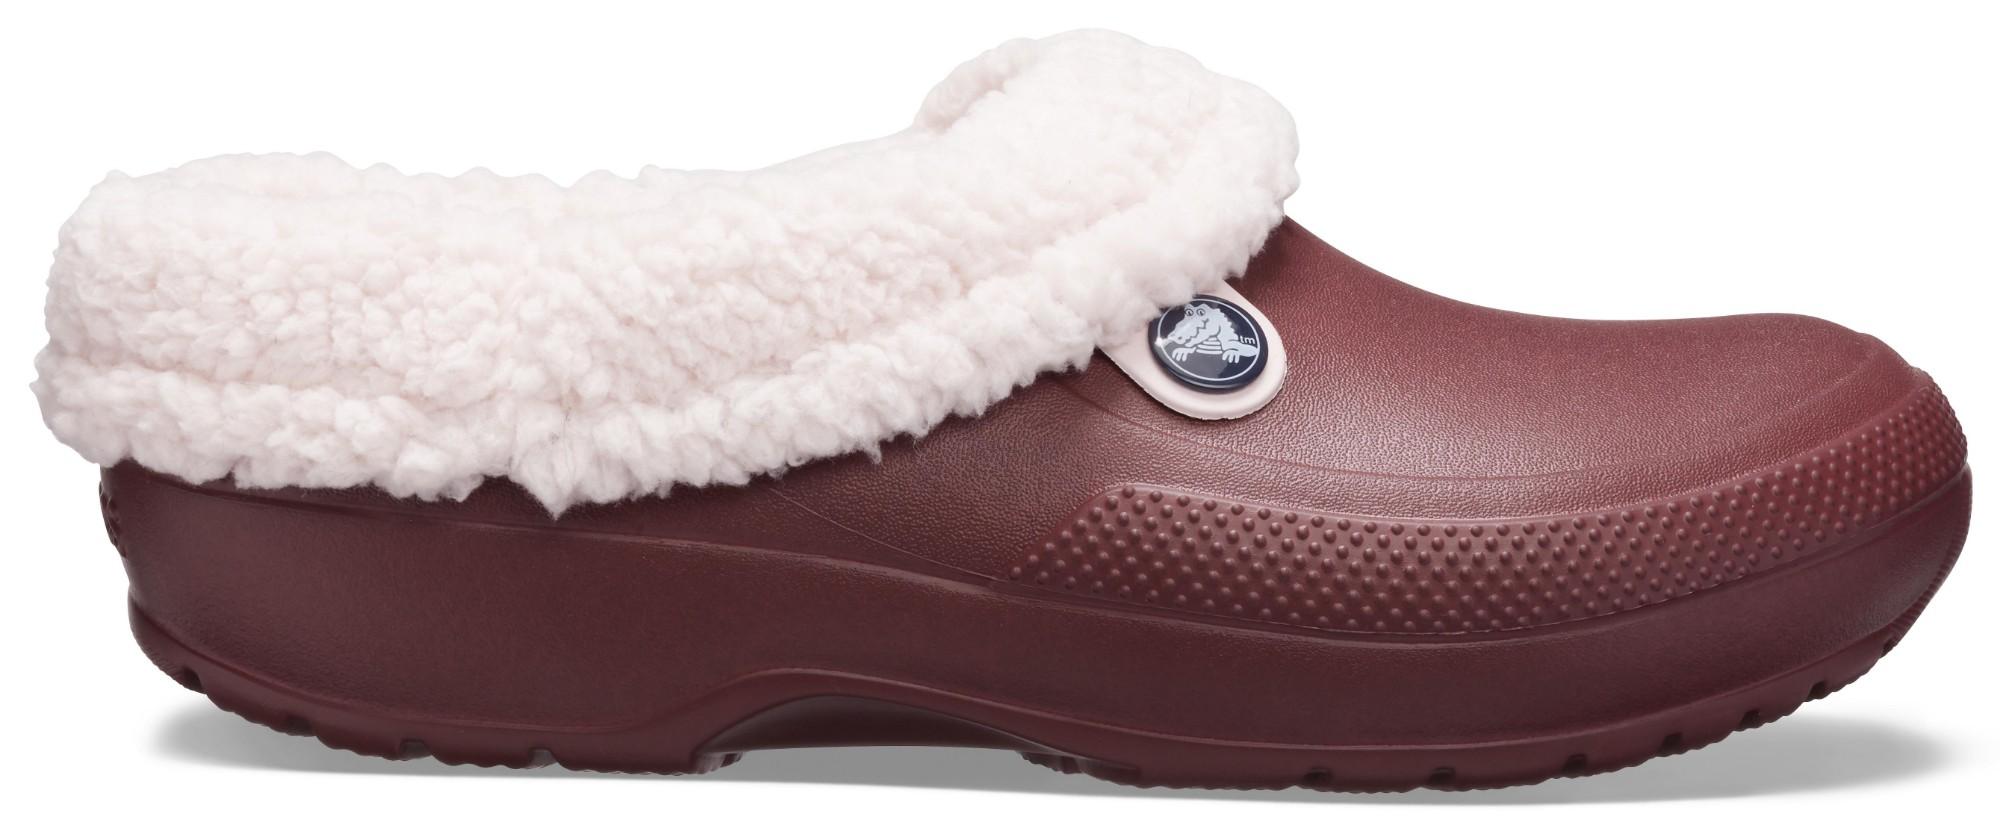 Crocs™ Classic Blitzen III Clog Burgundy/Barely Pink 39,5